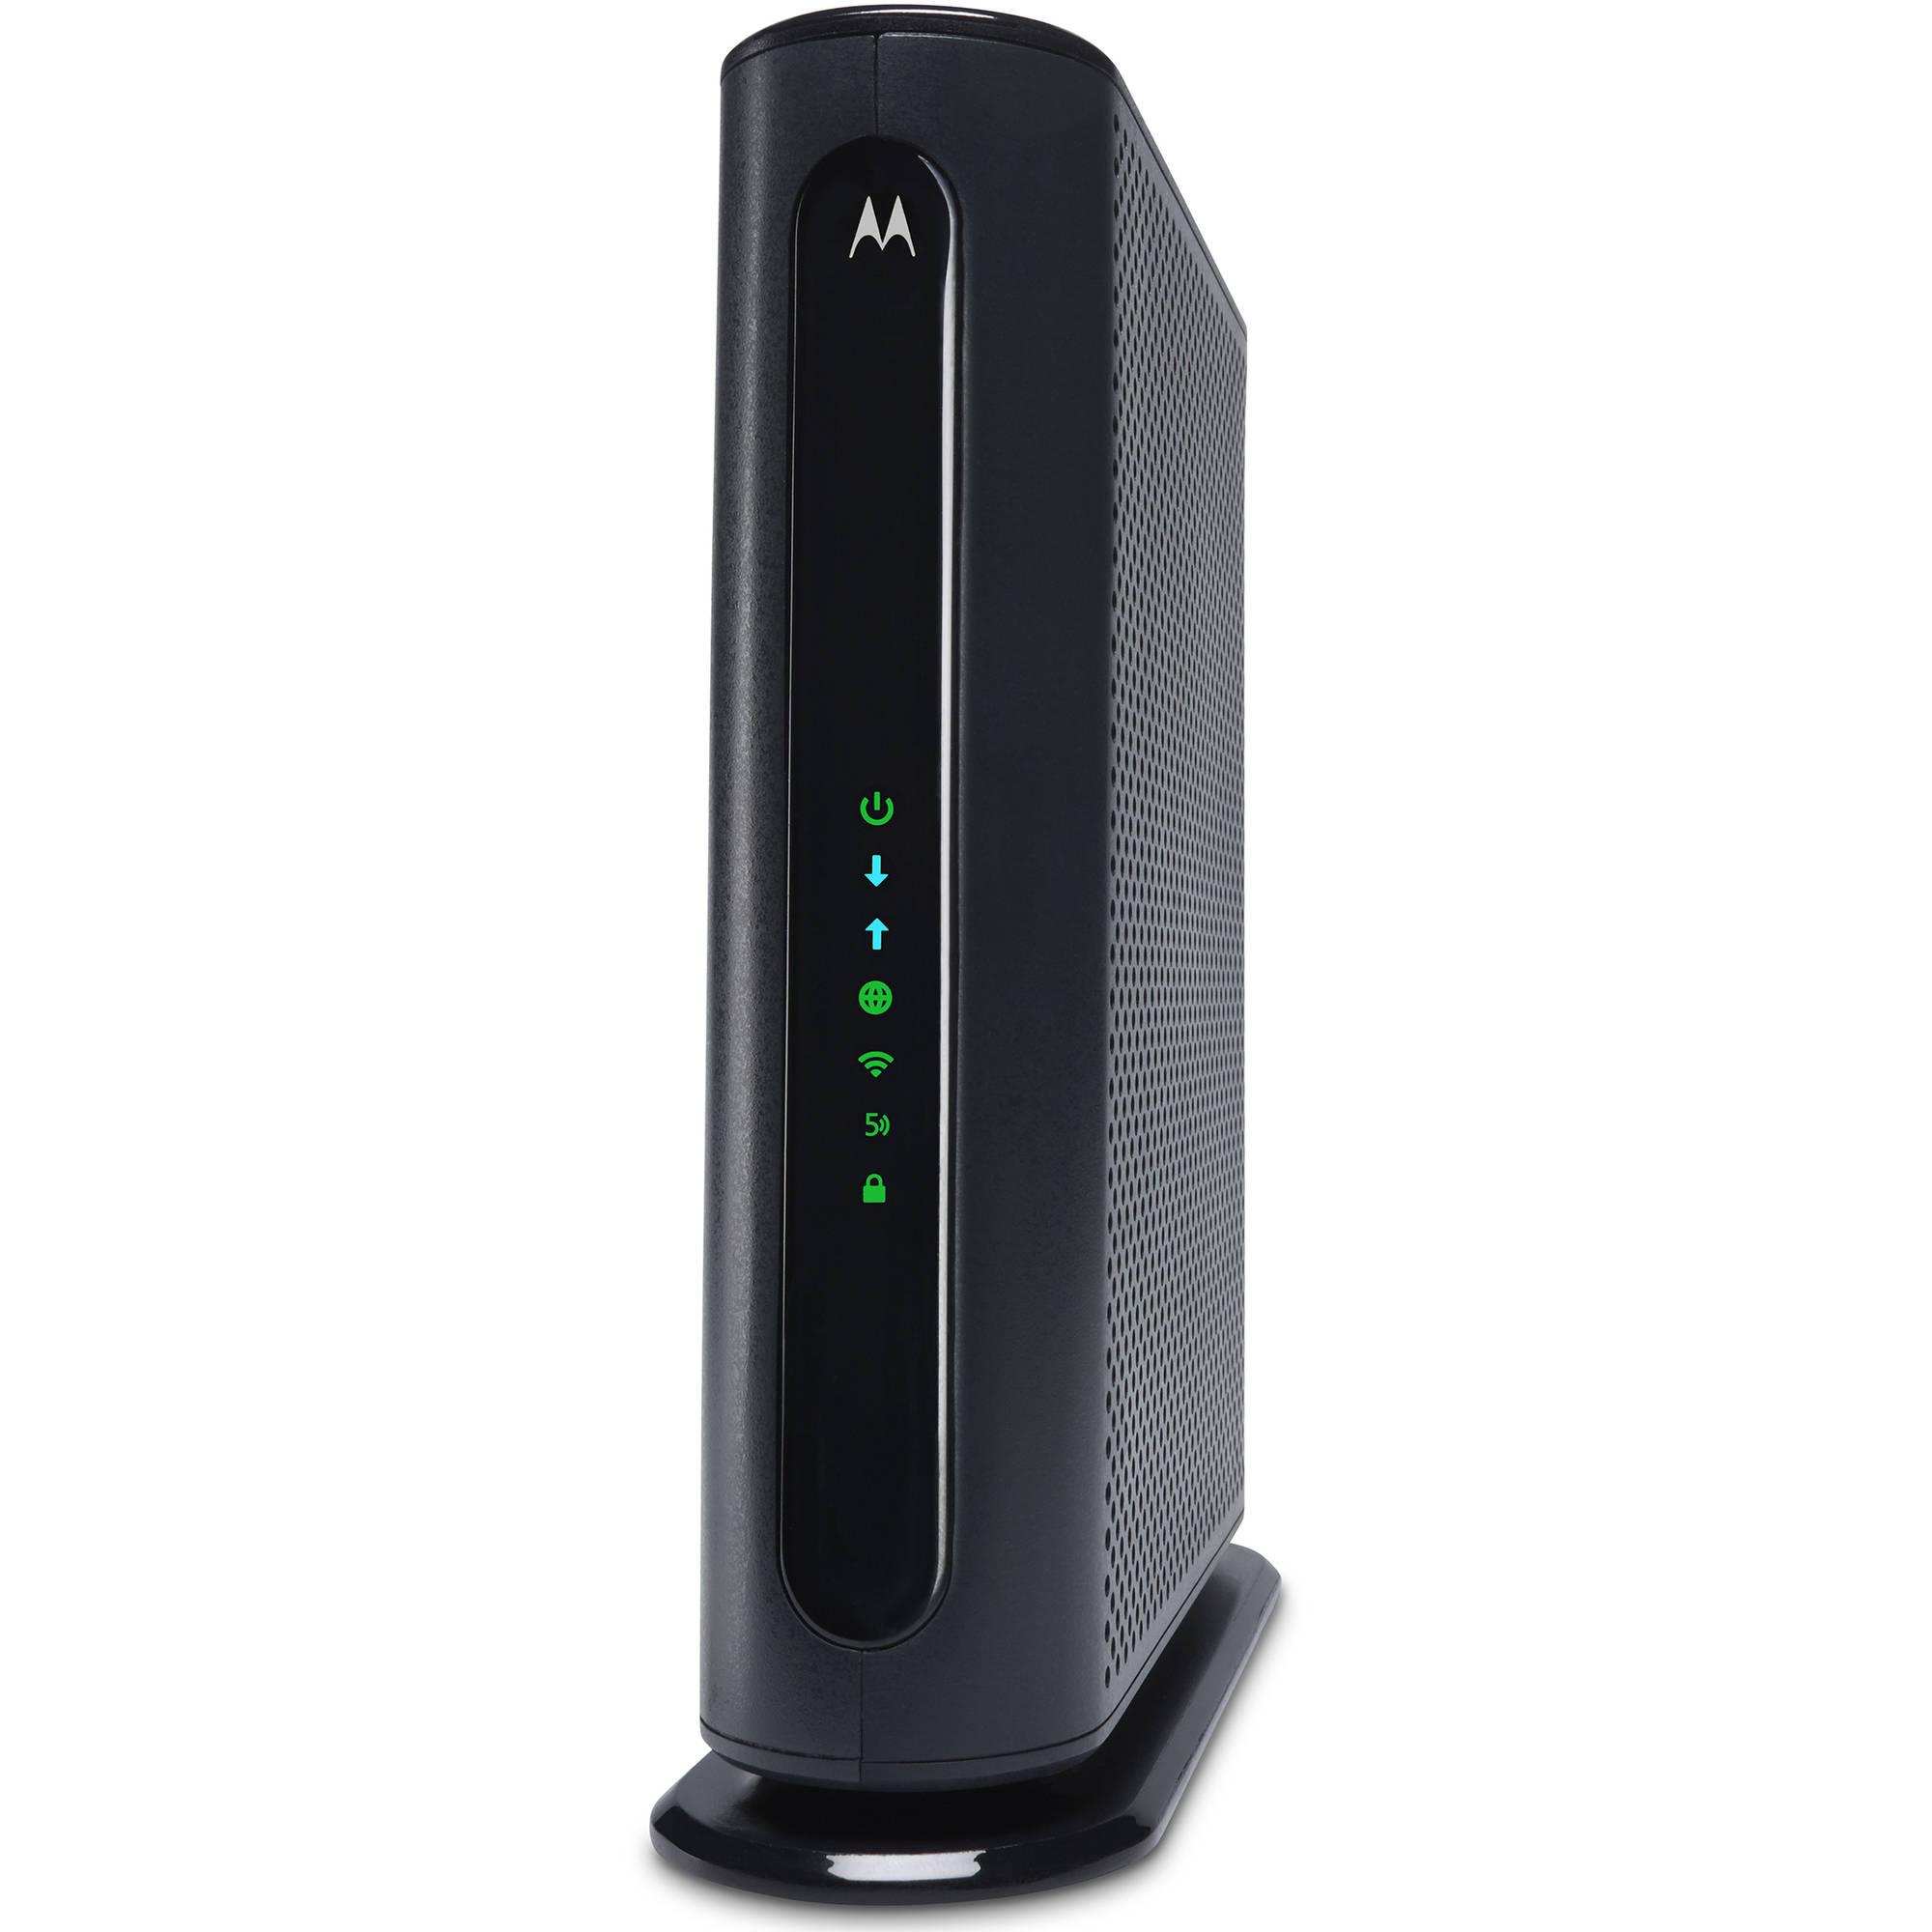 Motorola MG7550 cable modem /router combo $45 Walmart ymmv